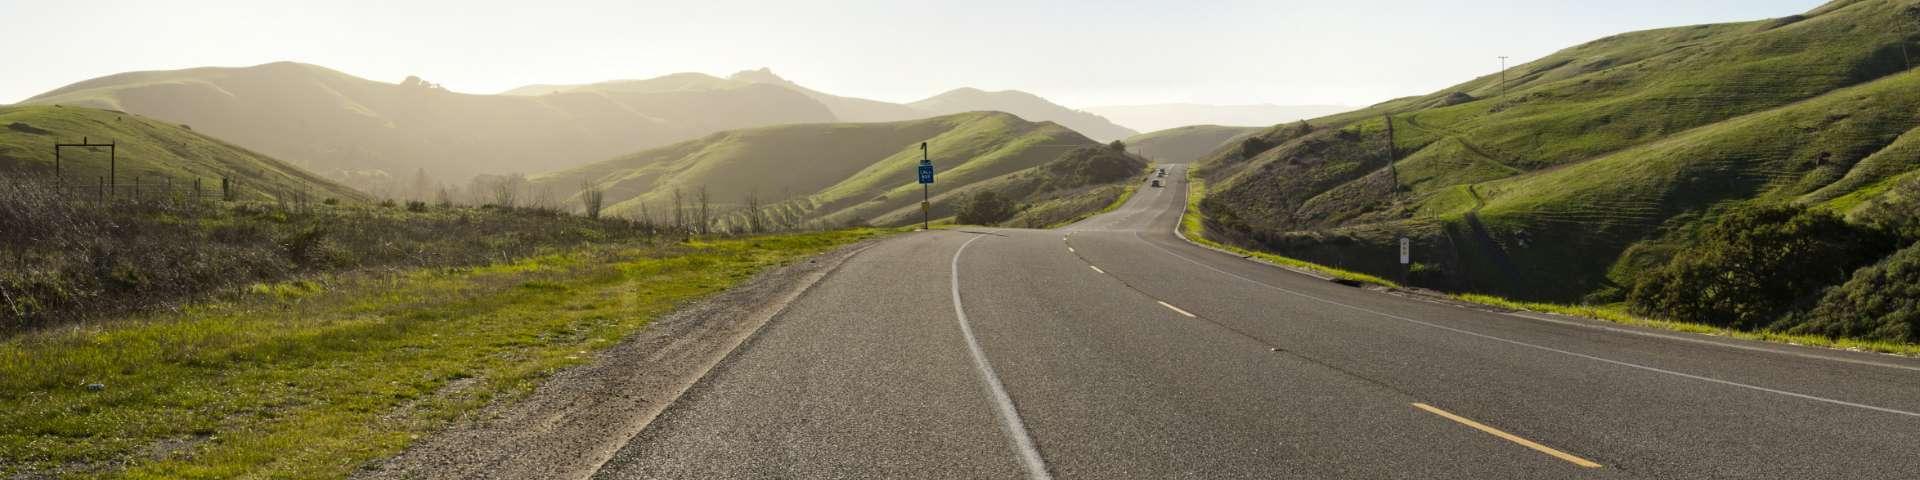 a country road in charleston south carolina